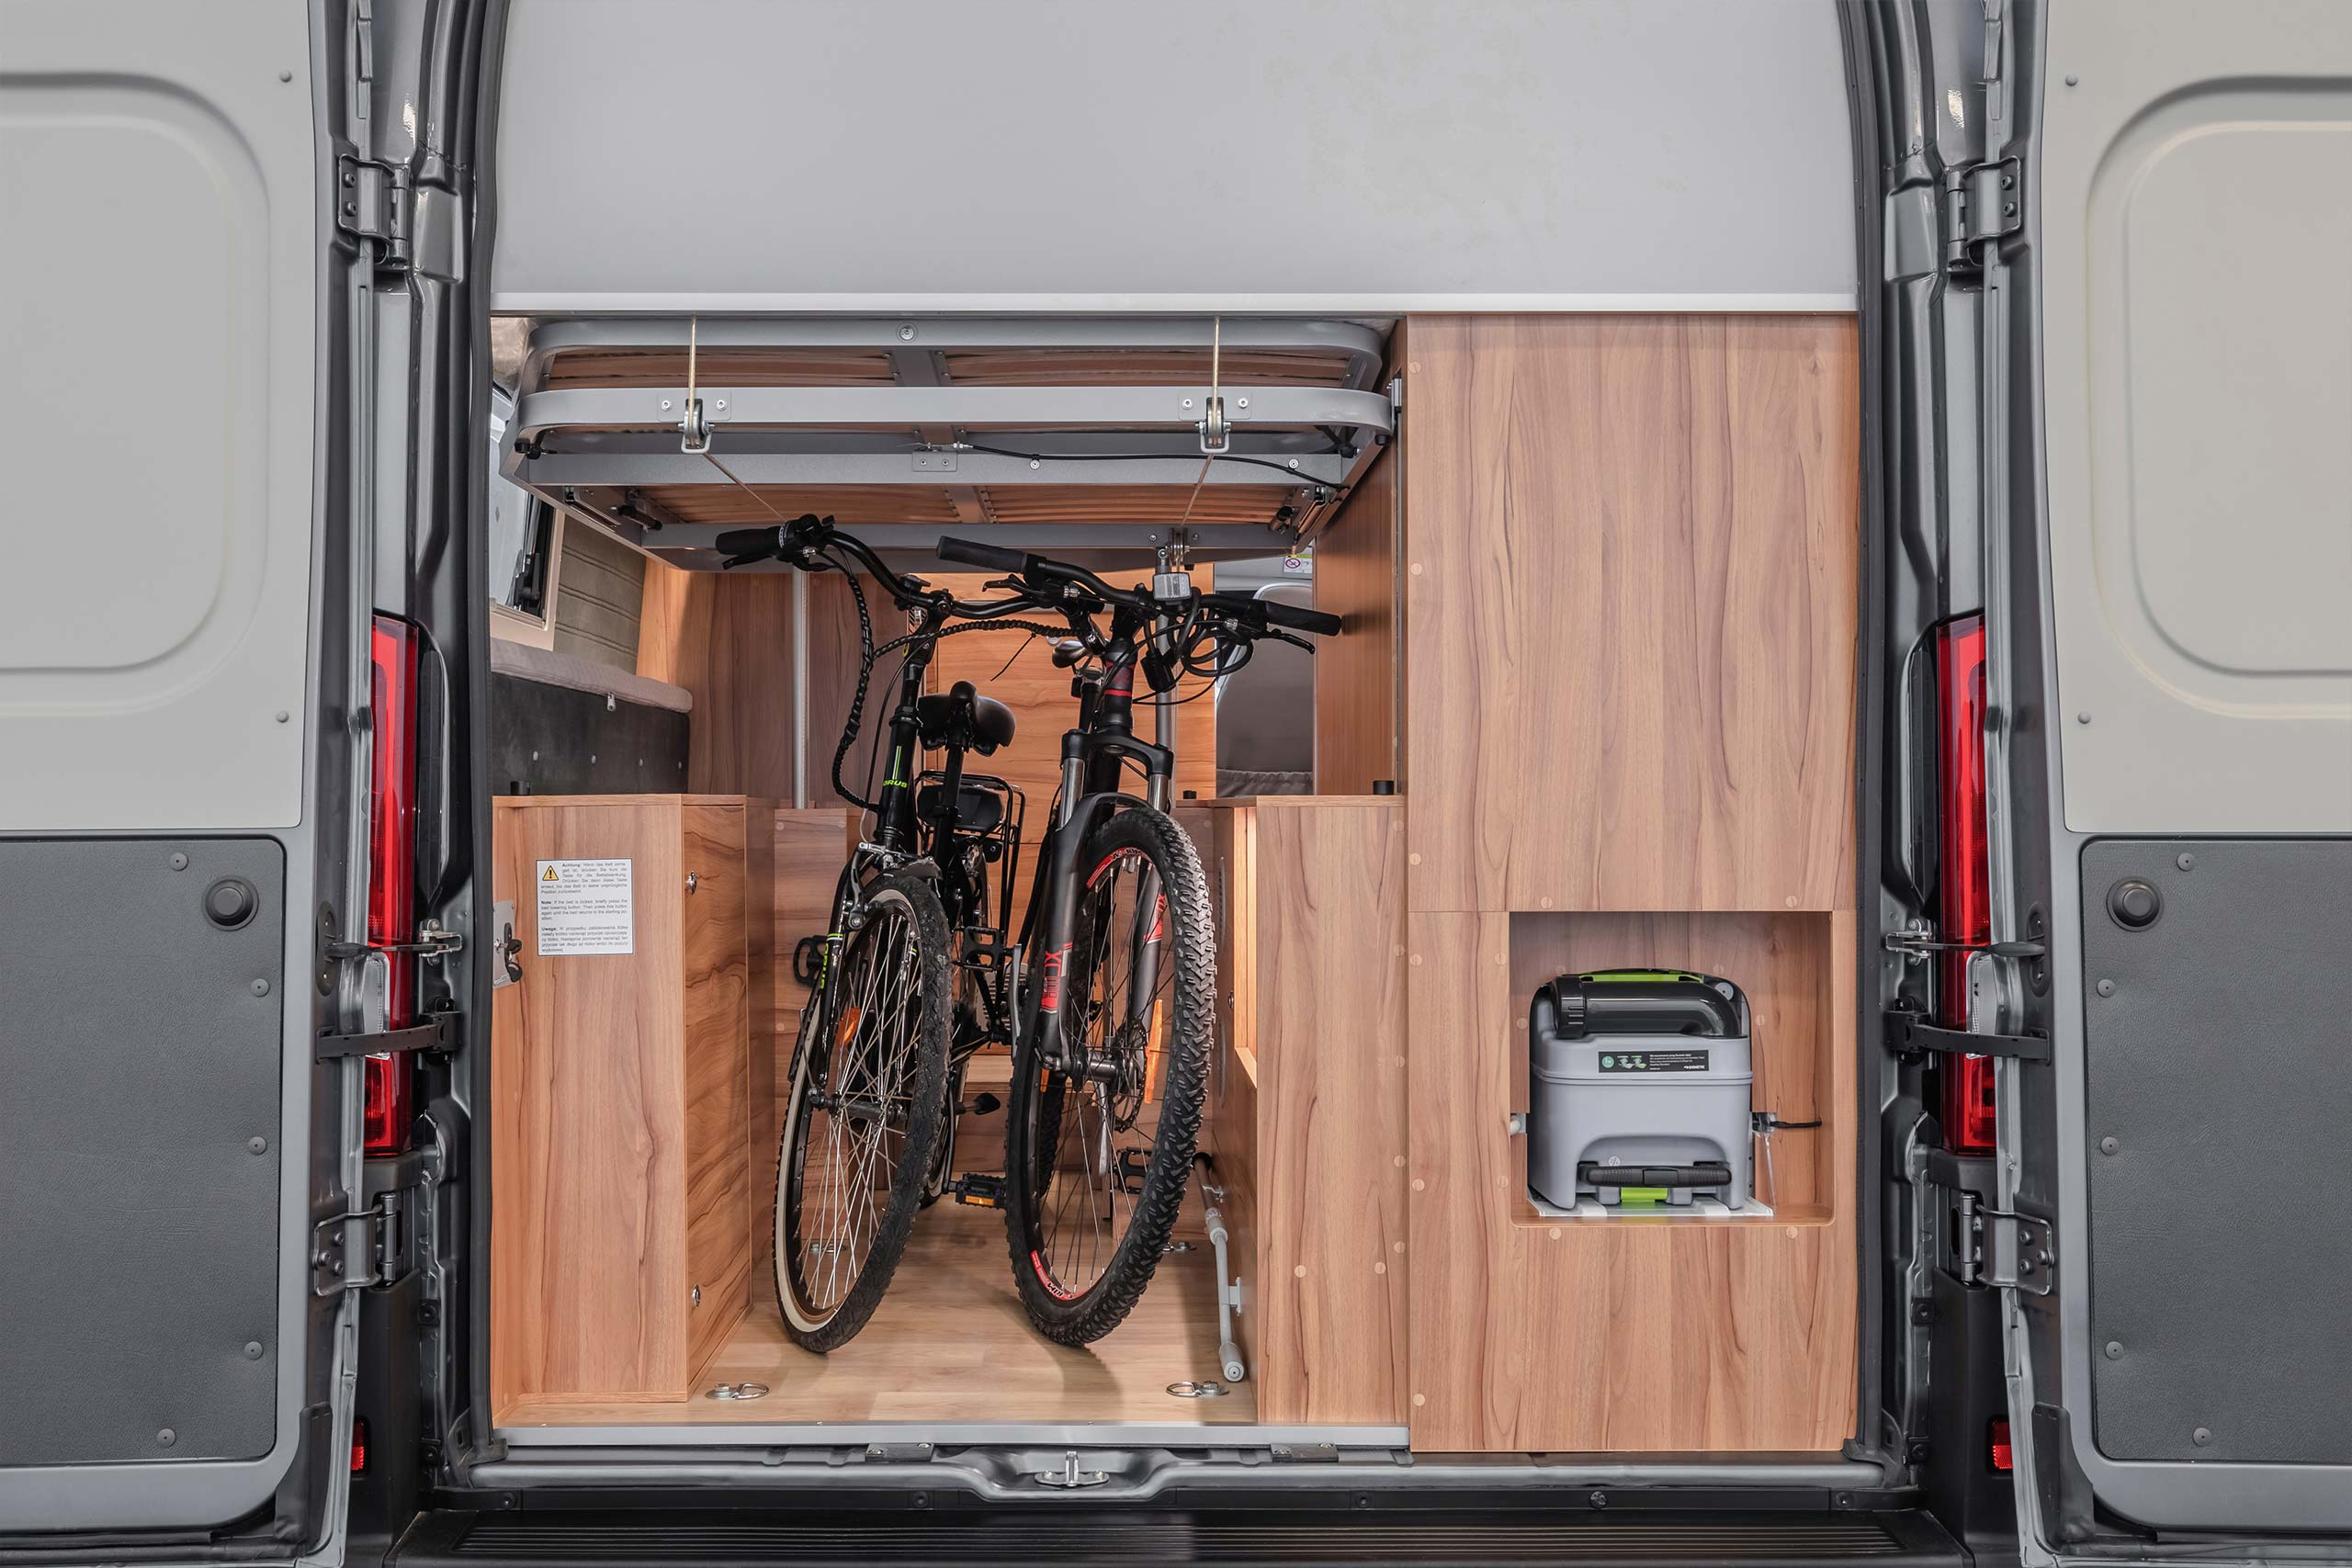 Camper van with two bikes inside